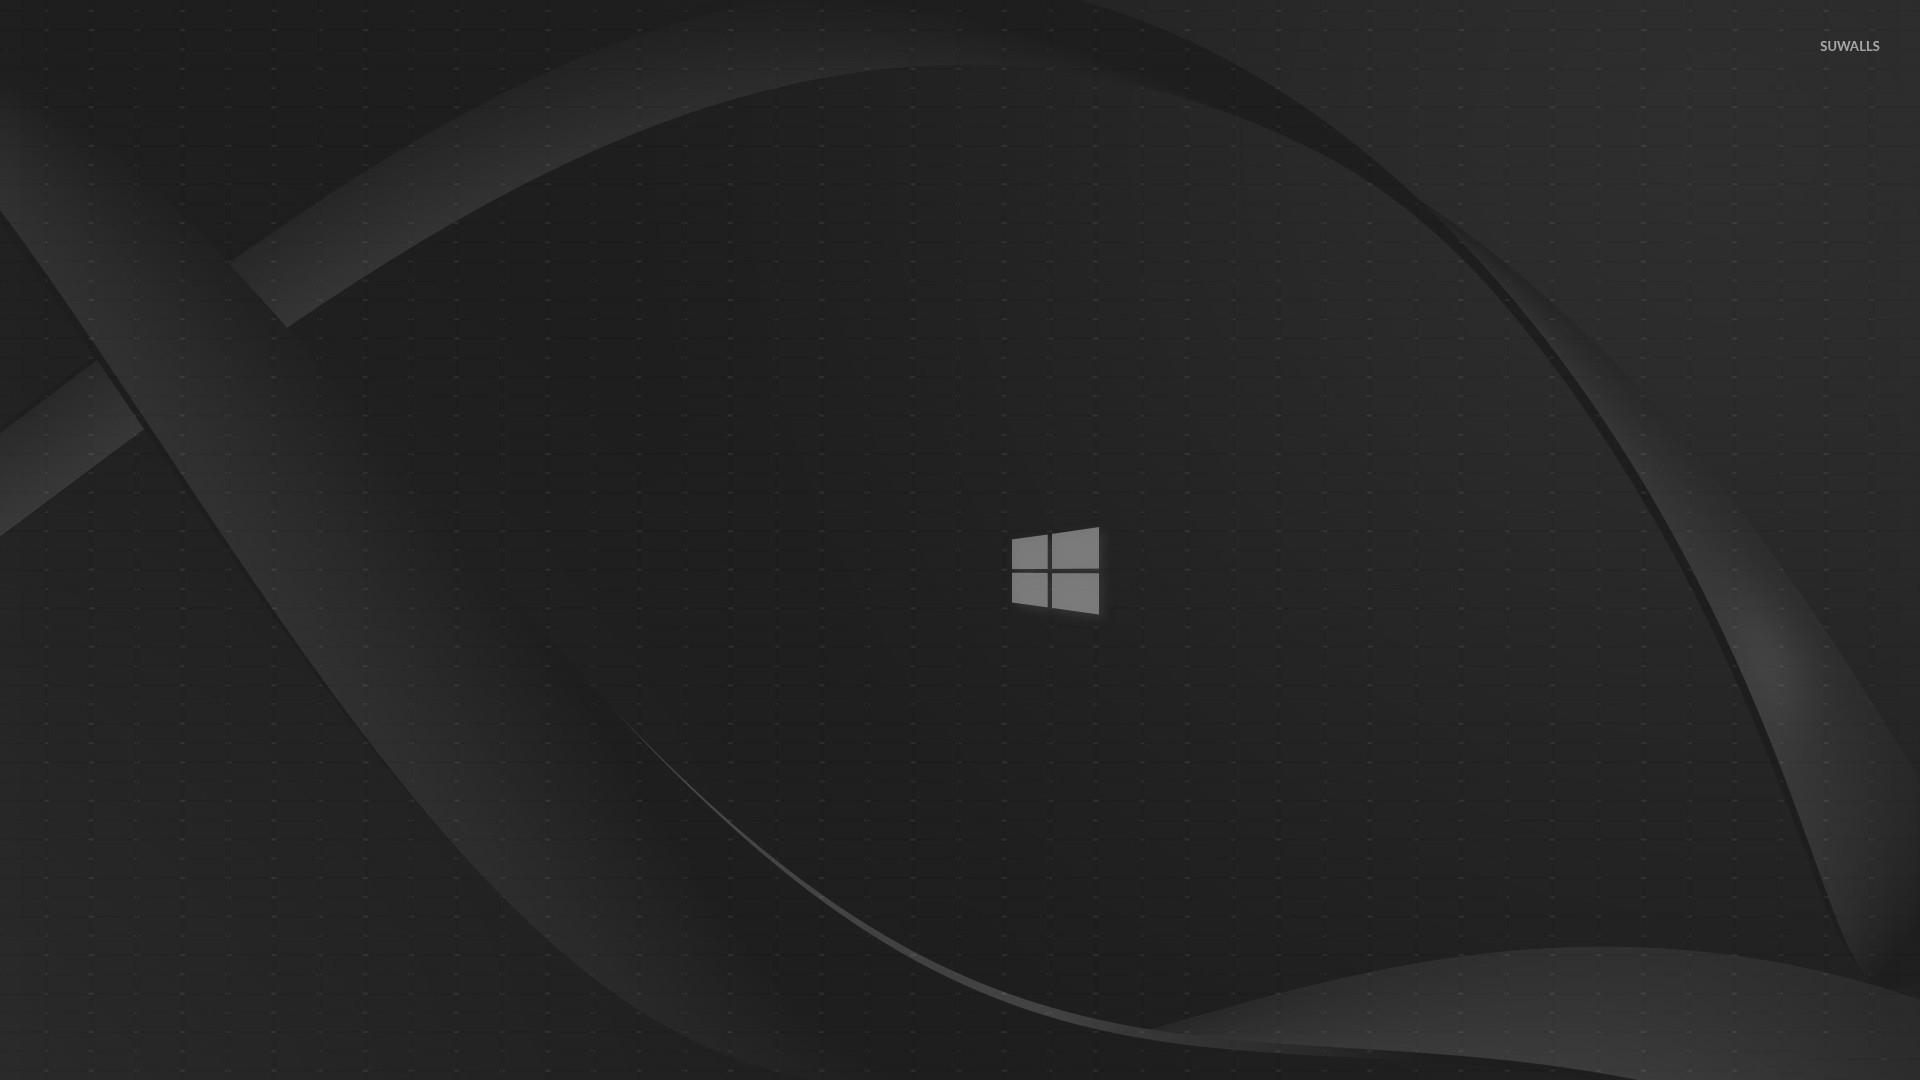 Windows 10 Wallpaper 1920x1080 75 Images